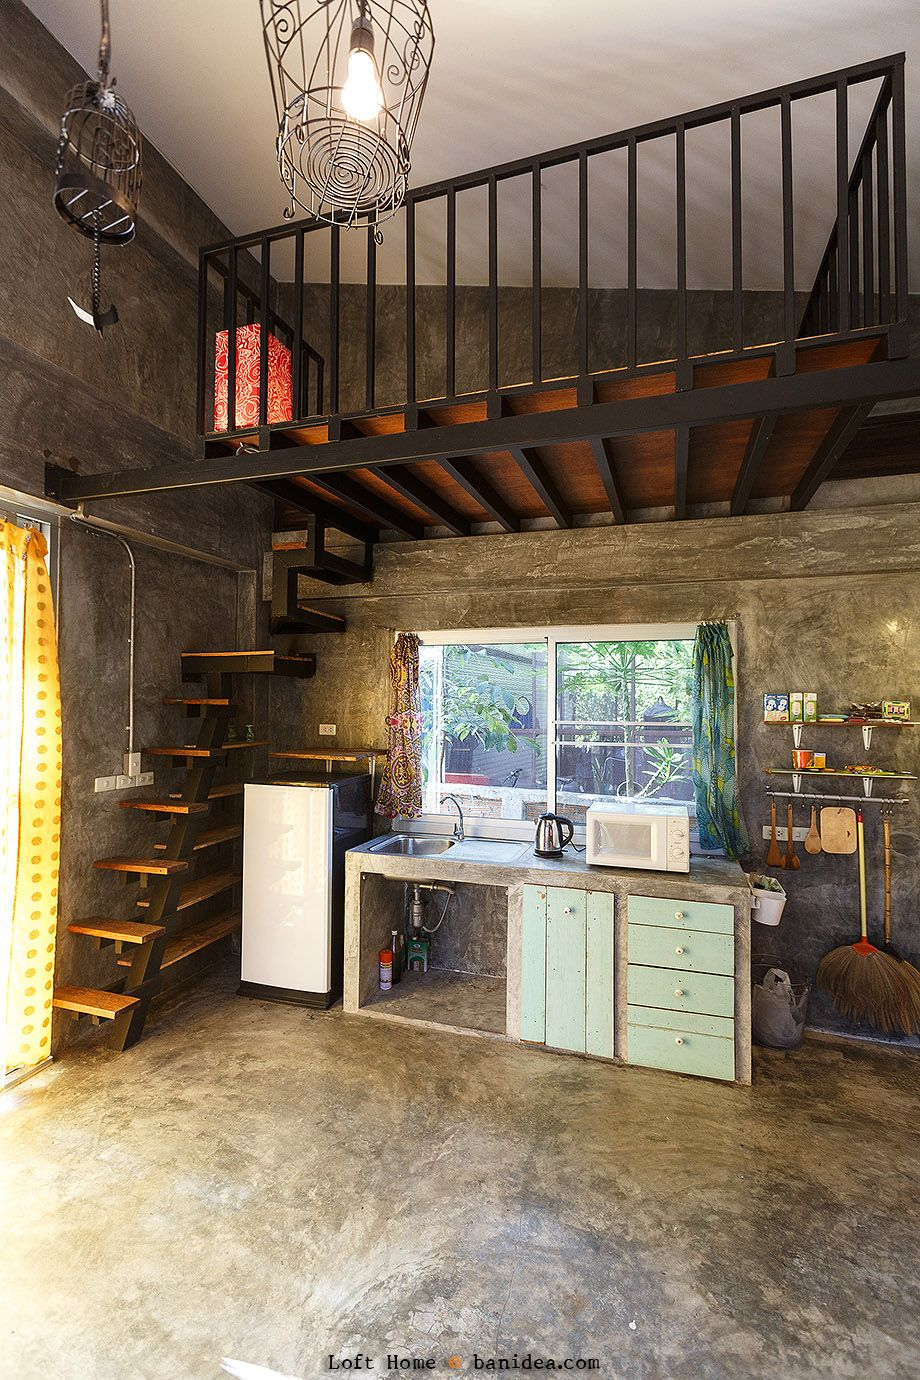 Loft-style bedroom design 150 photos